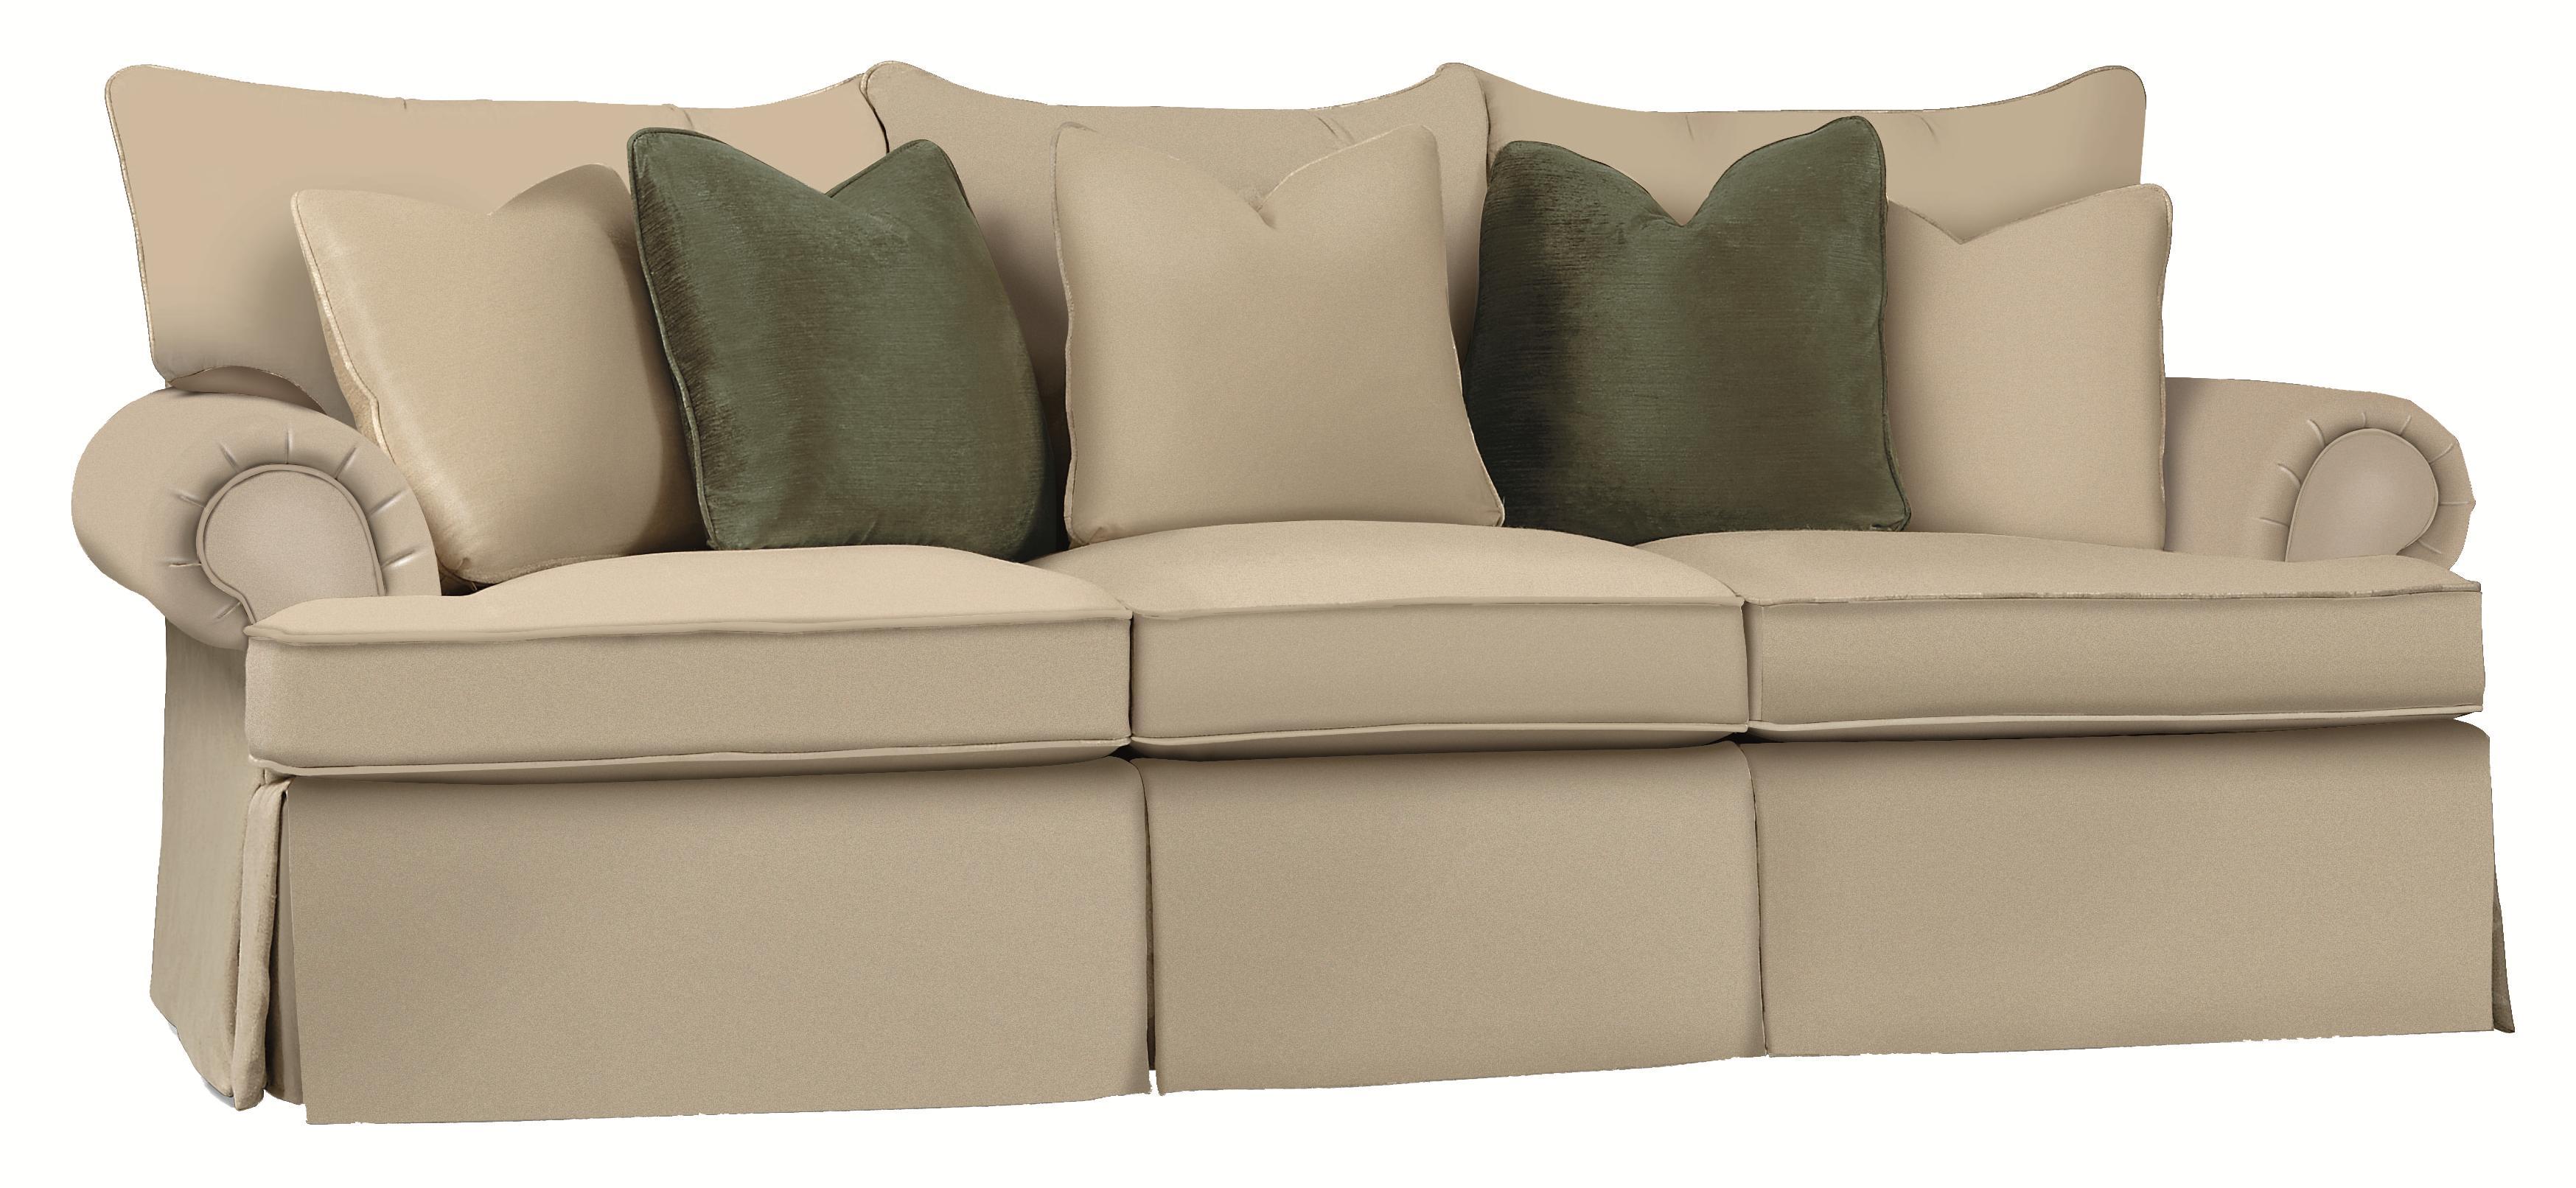 100 wayside furniture akron ohio hooker furniture 434 for Wayside furniture